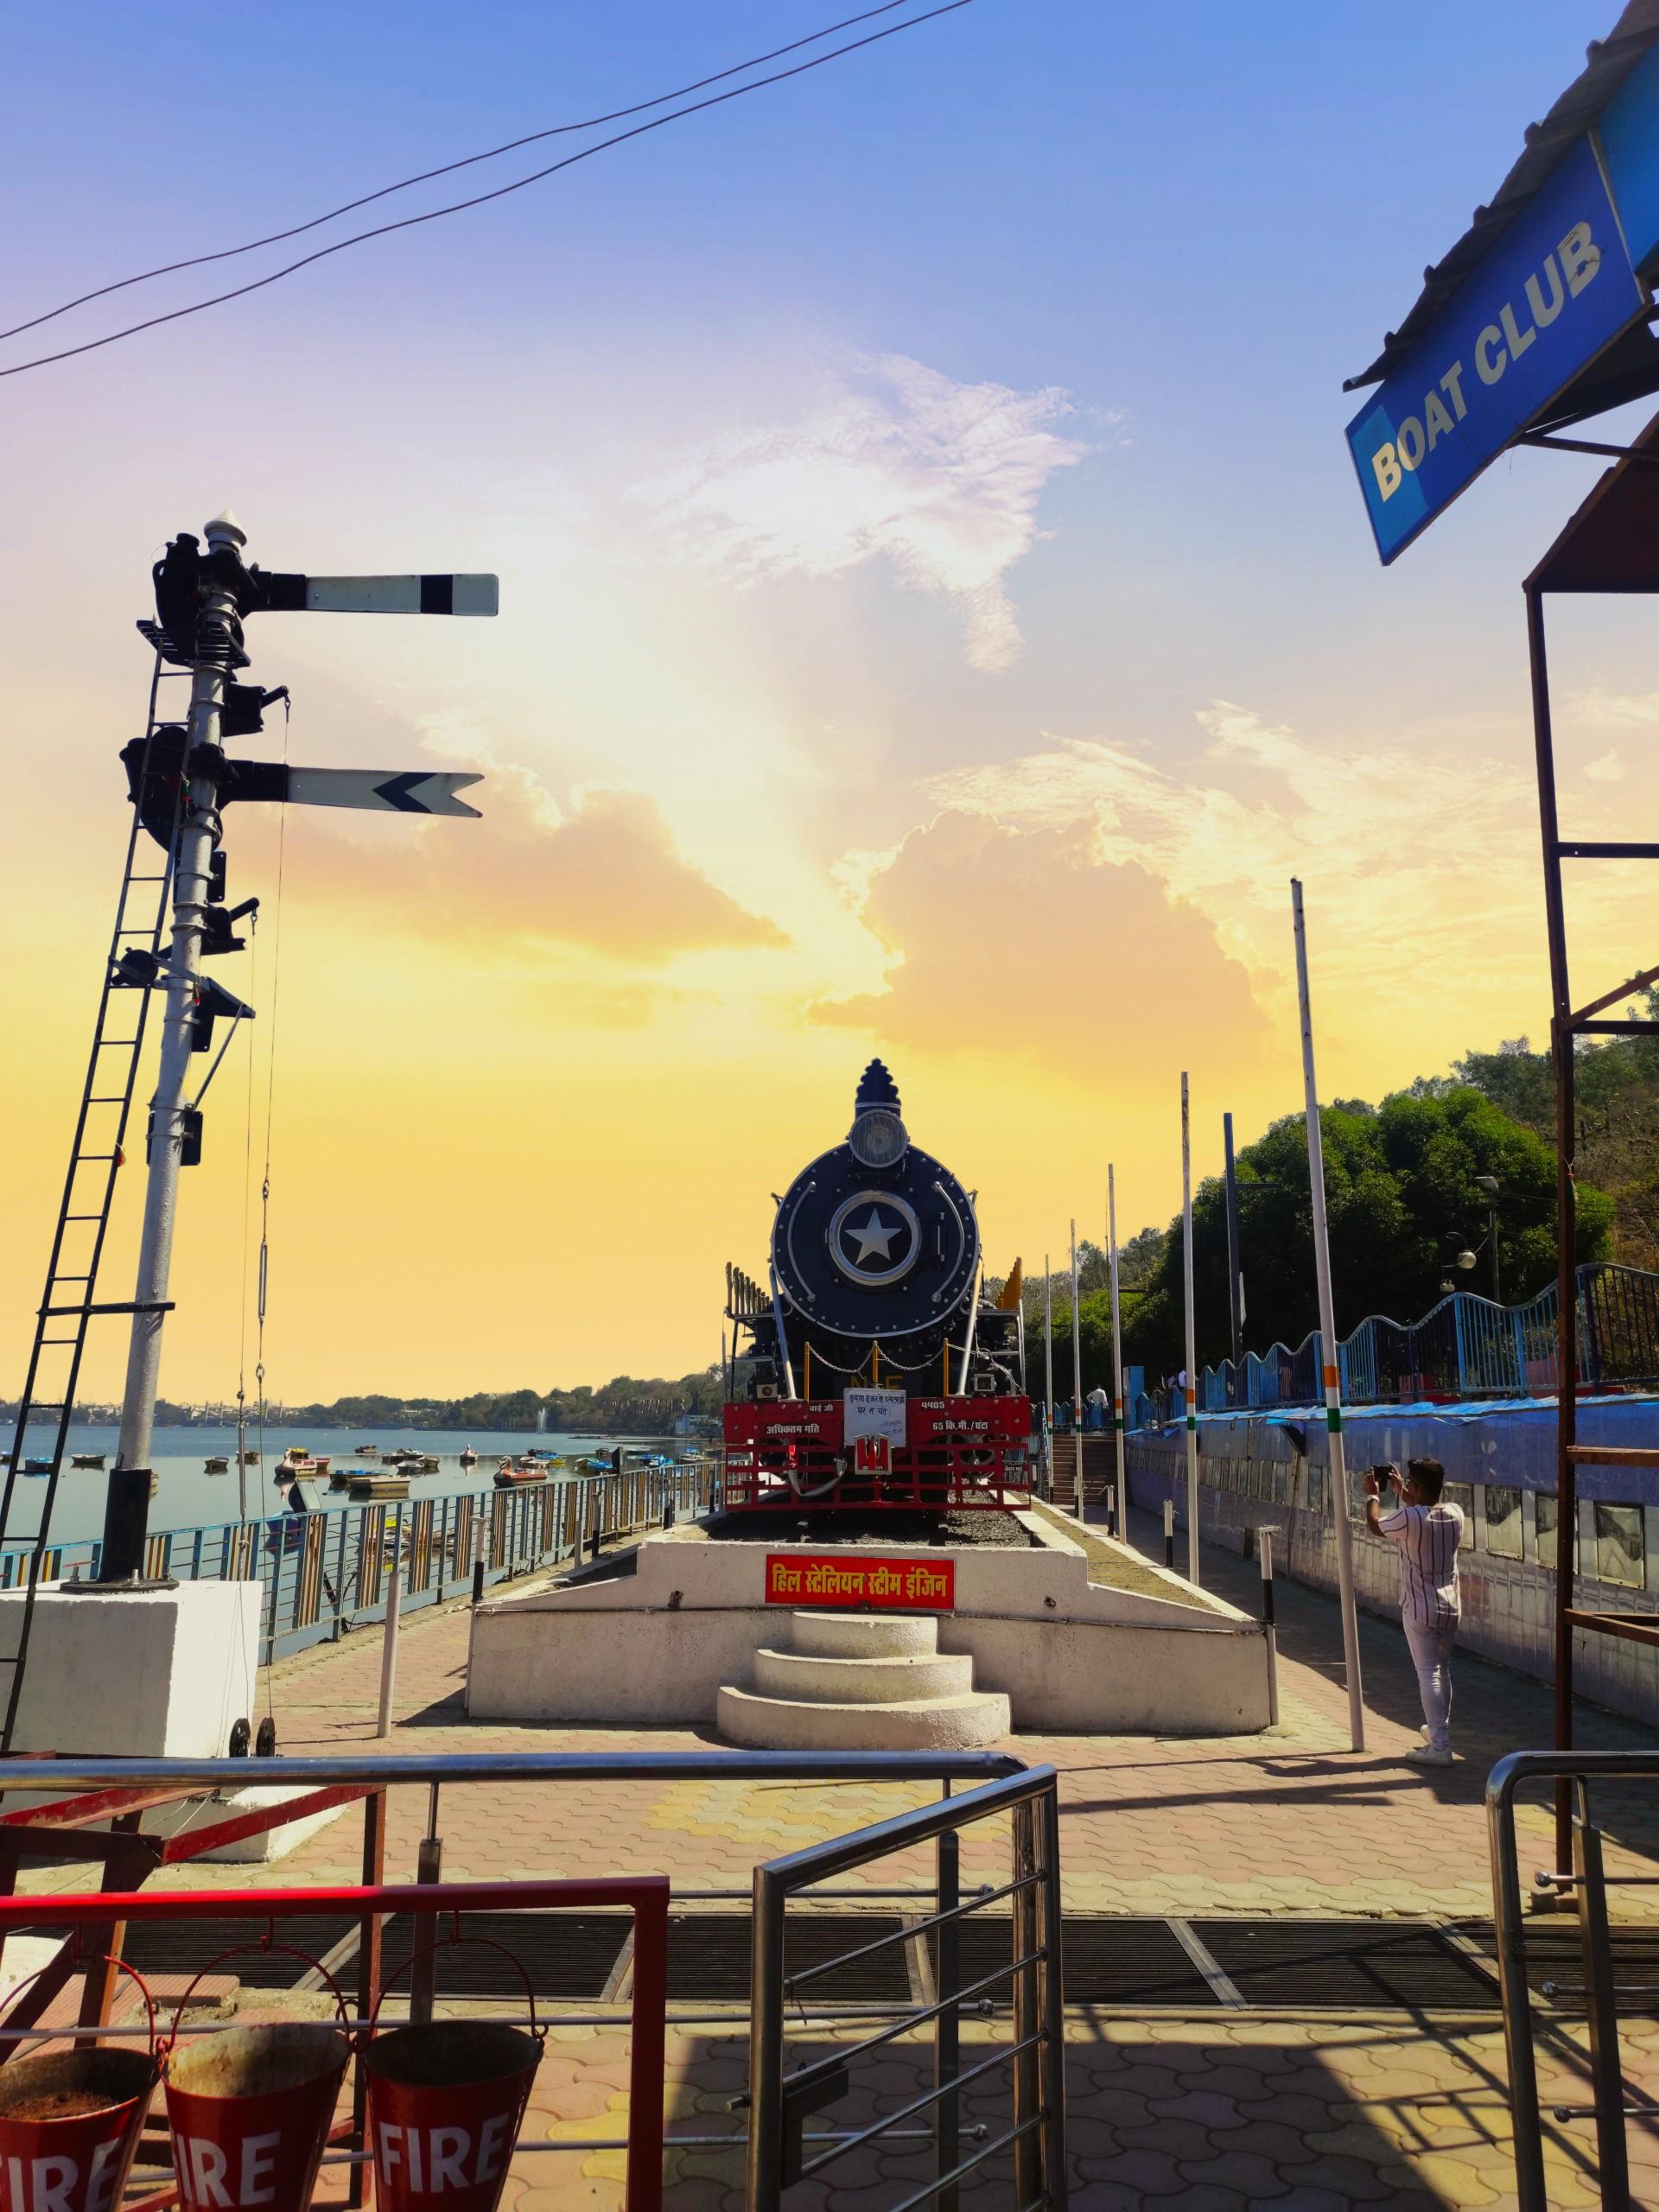 Train Ride and Resort